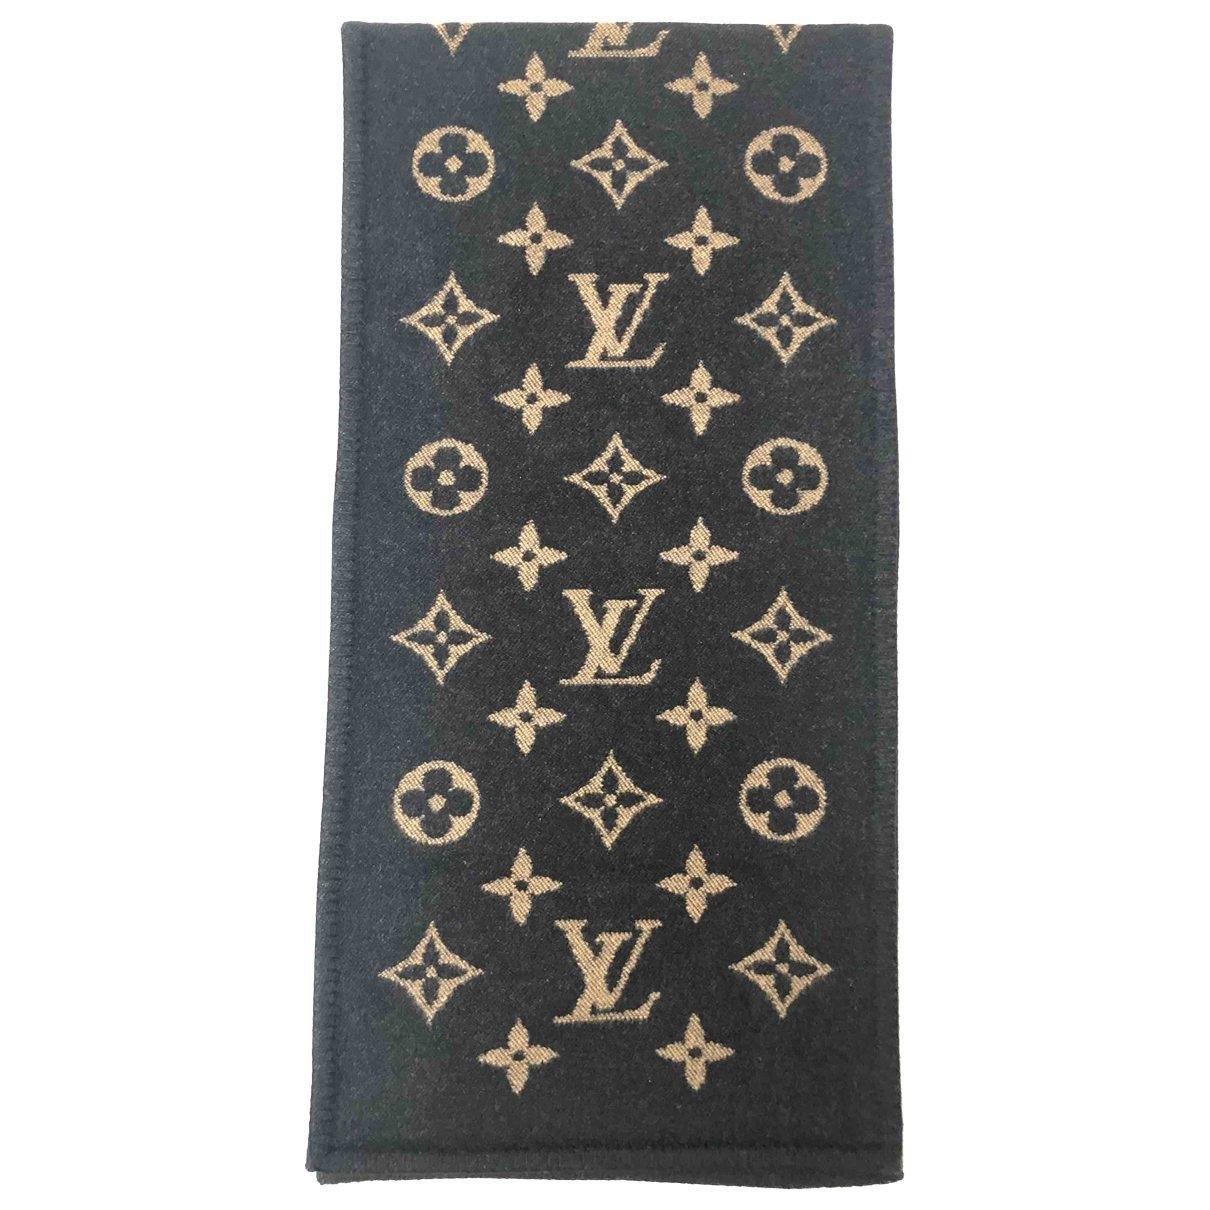 Manta de Cachemira Louis Vuitton